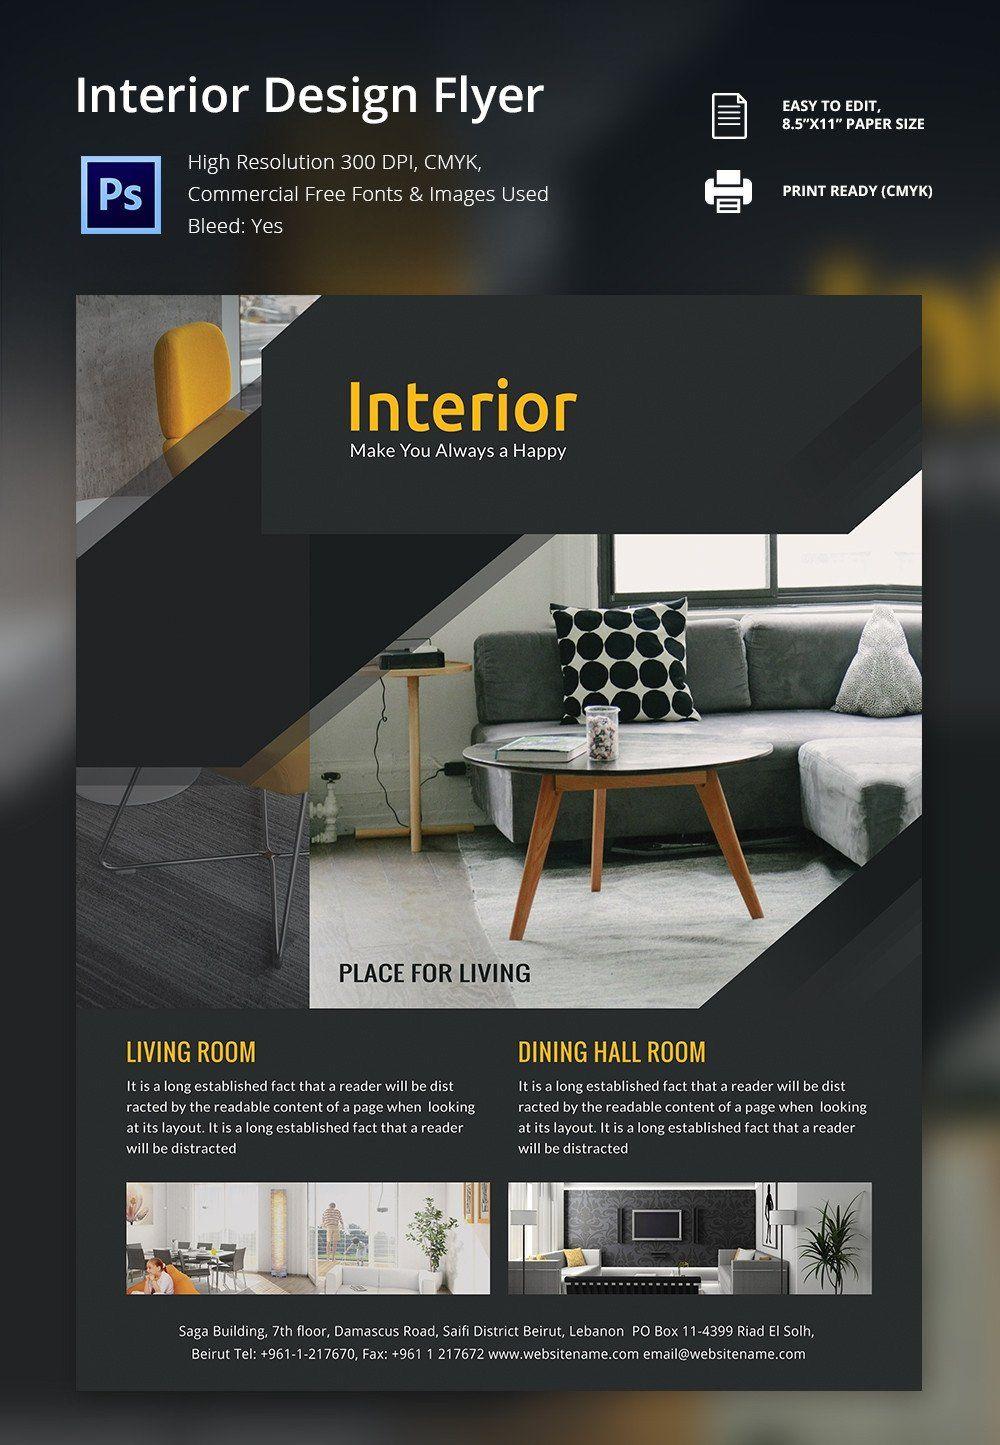 Free Flyers Designs Templates Interior Design Brochure 25 Free Psd Eps Indesign Interior Design Flyer Free Flyer Design Flyer Design